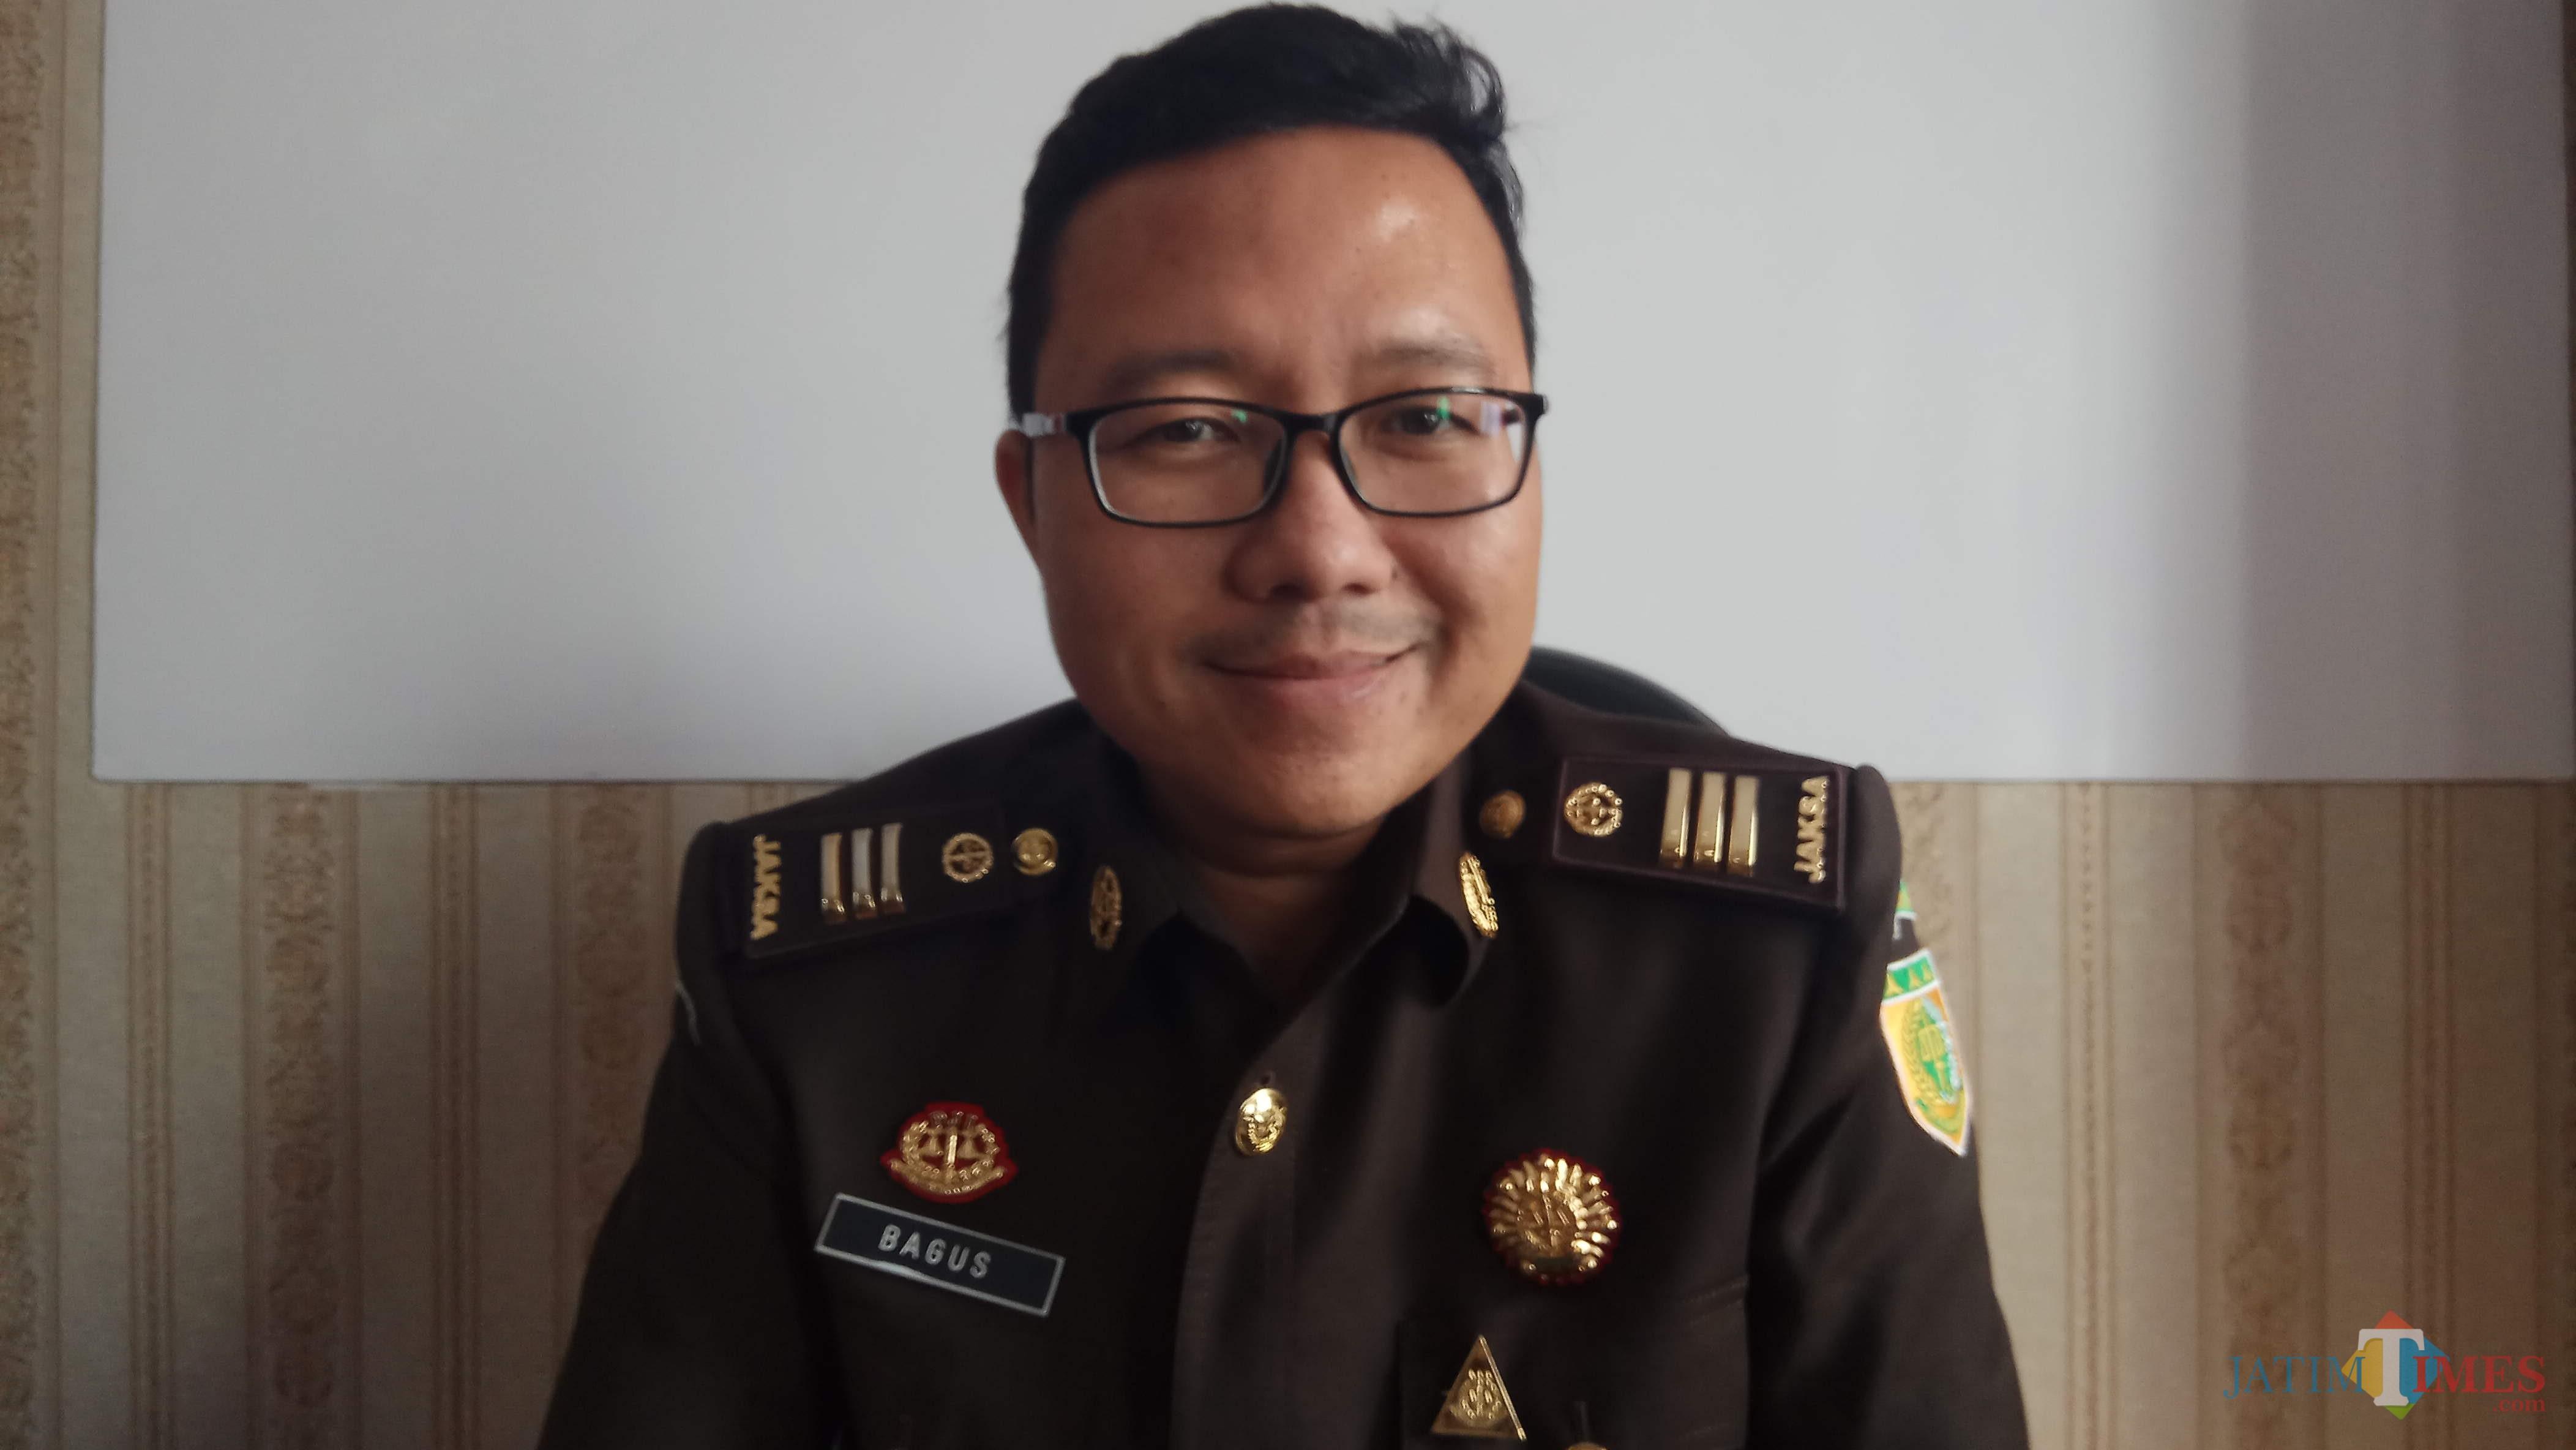 Kasi Intelijen Kejaksaan Negeri Banyuwangi Bagus Nurjakfar Adi Saputro